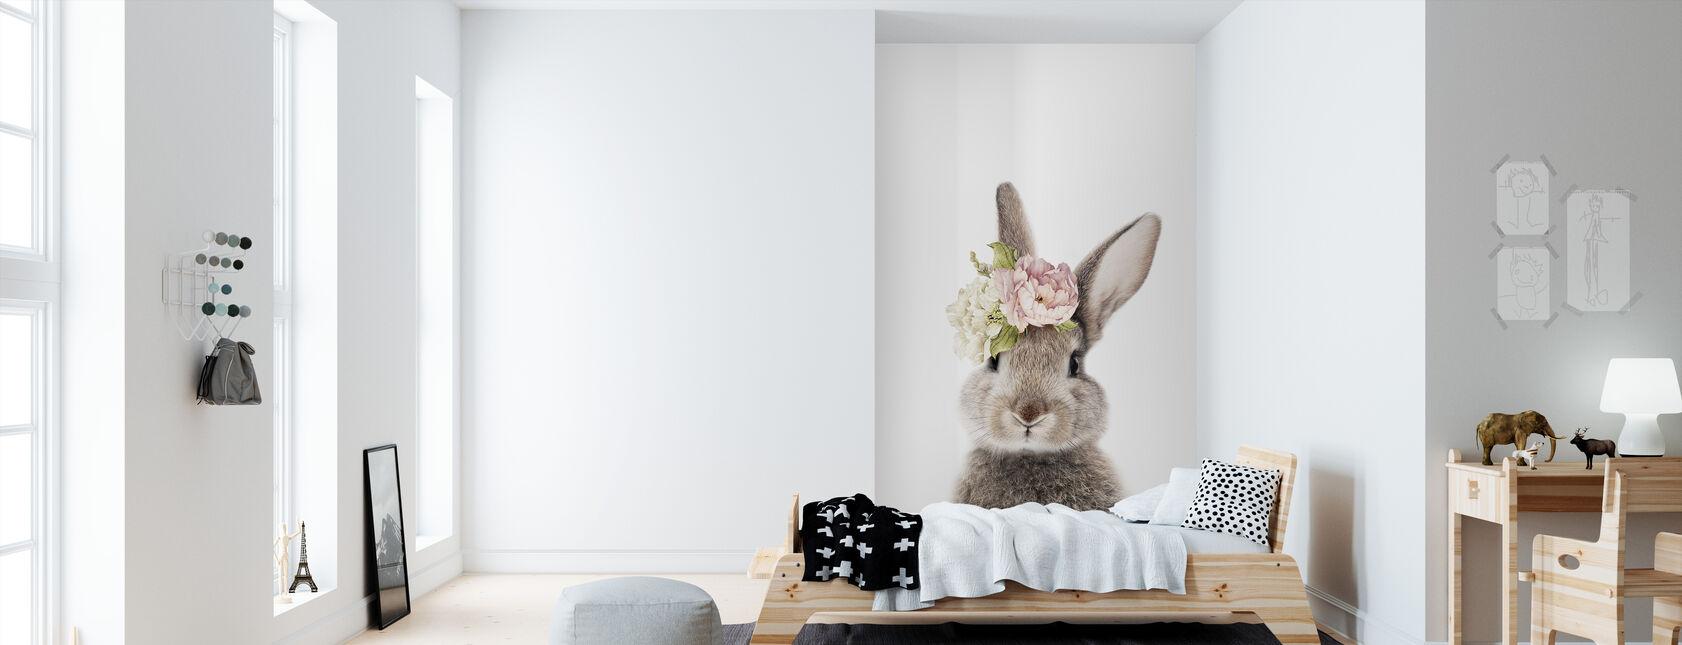 Floral Bunny - Wallpaper - Kids Room